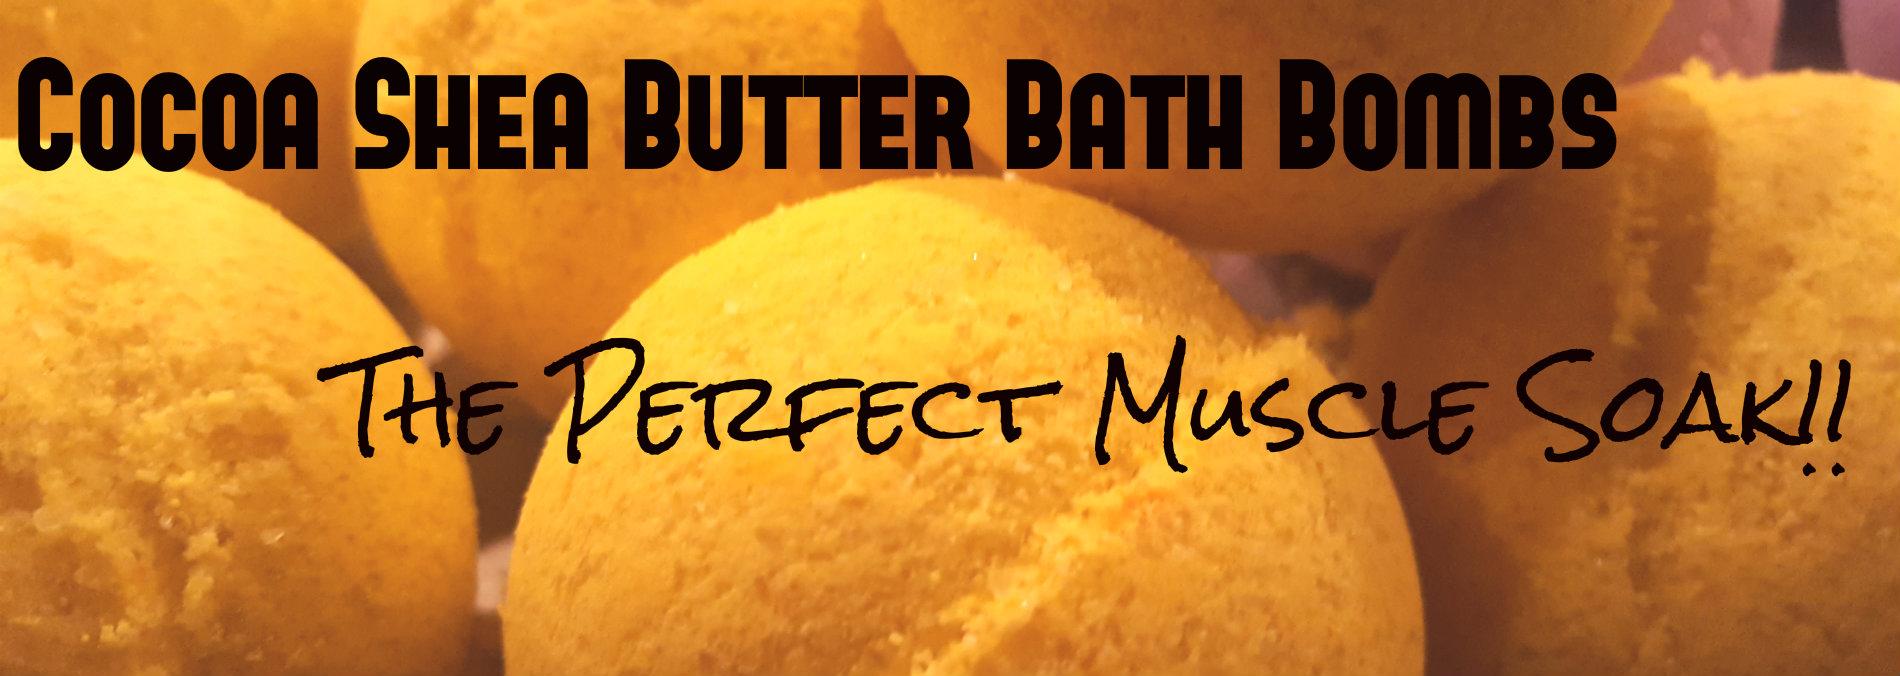 bath-bomb-banner.jpg